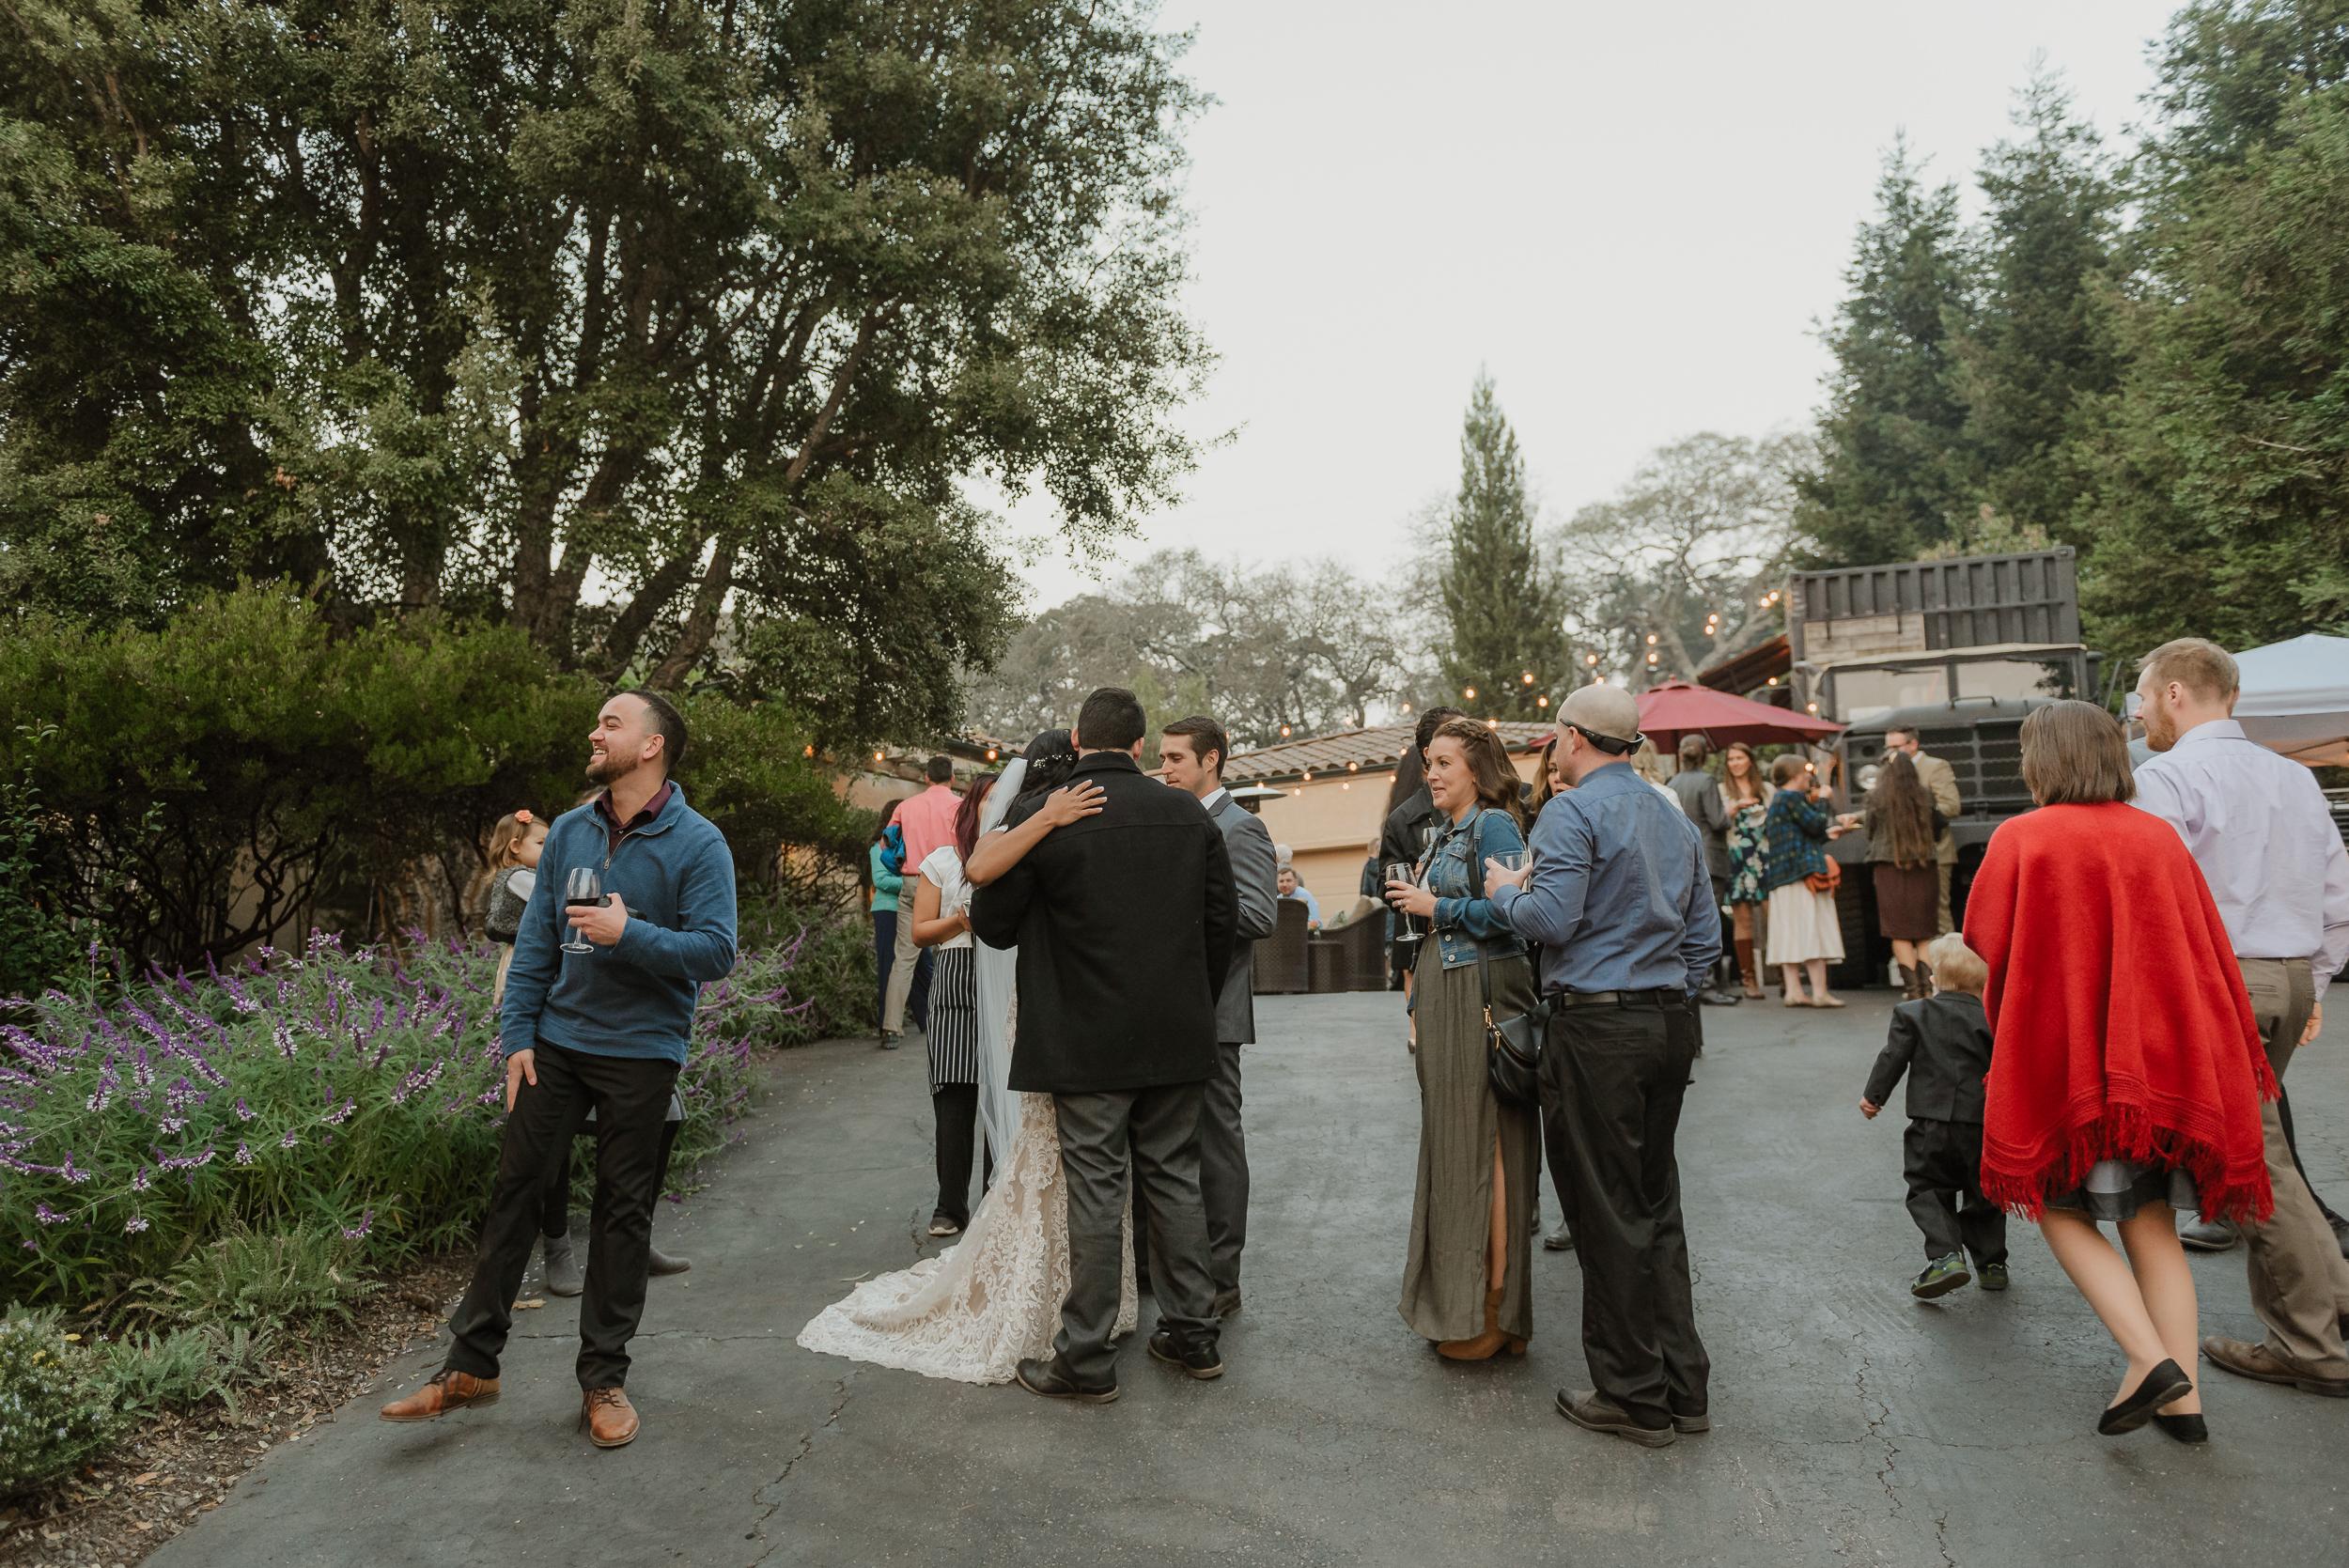 085marin-petaluma-backyard-wedding-vivianchen-556.jpg